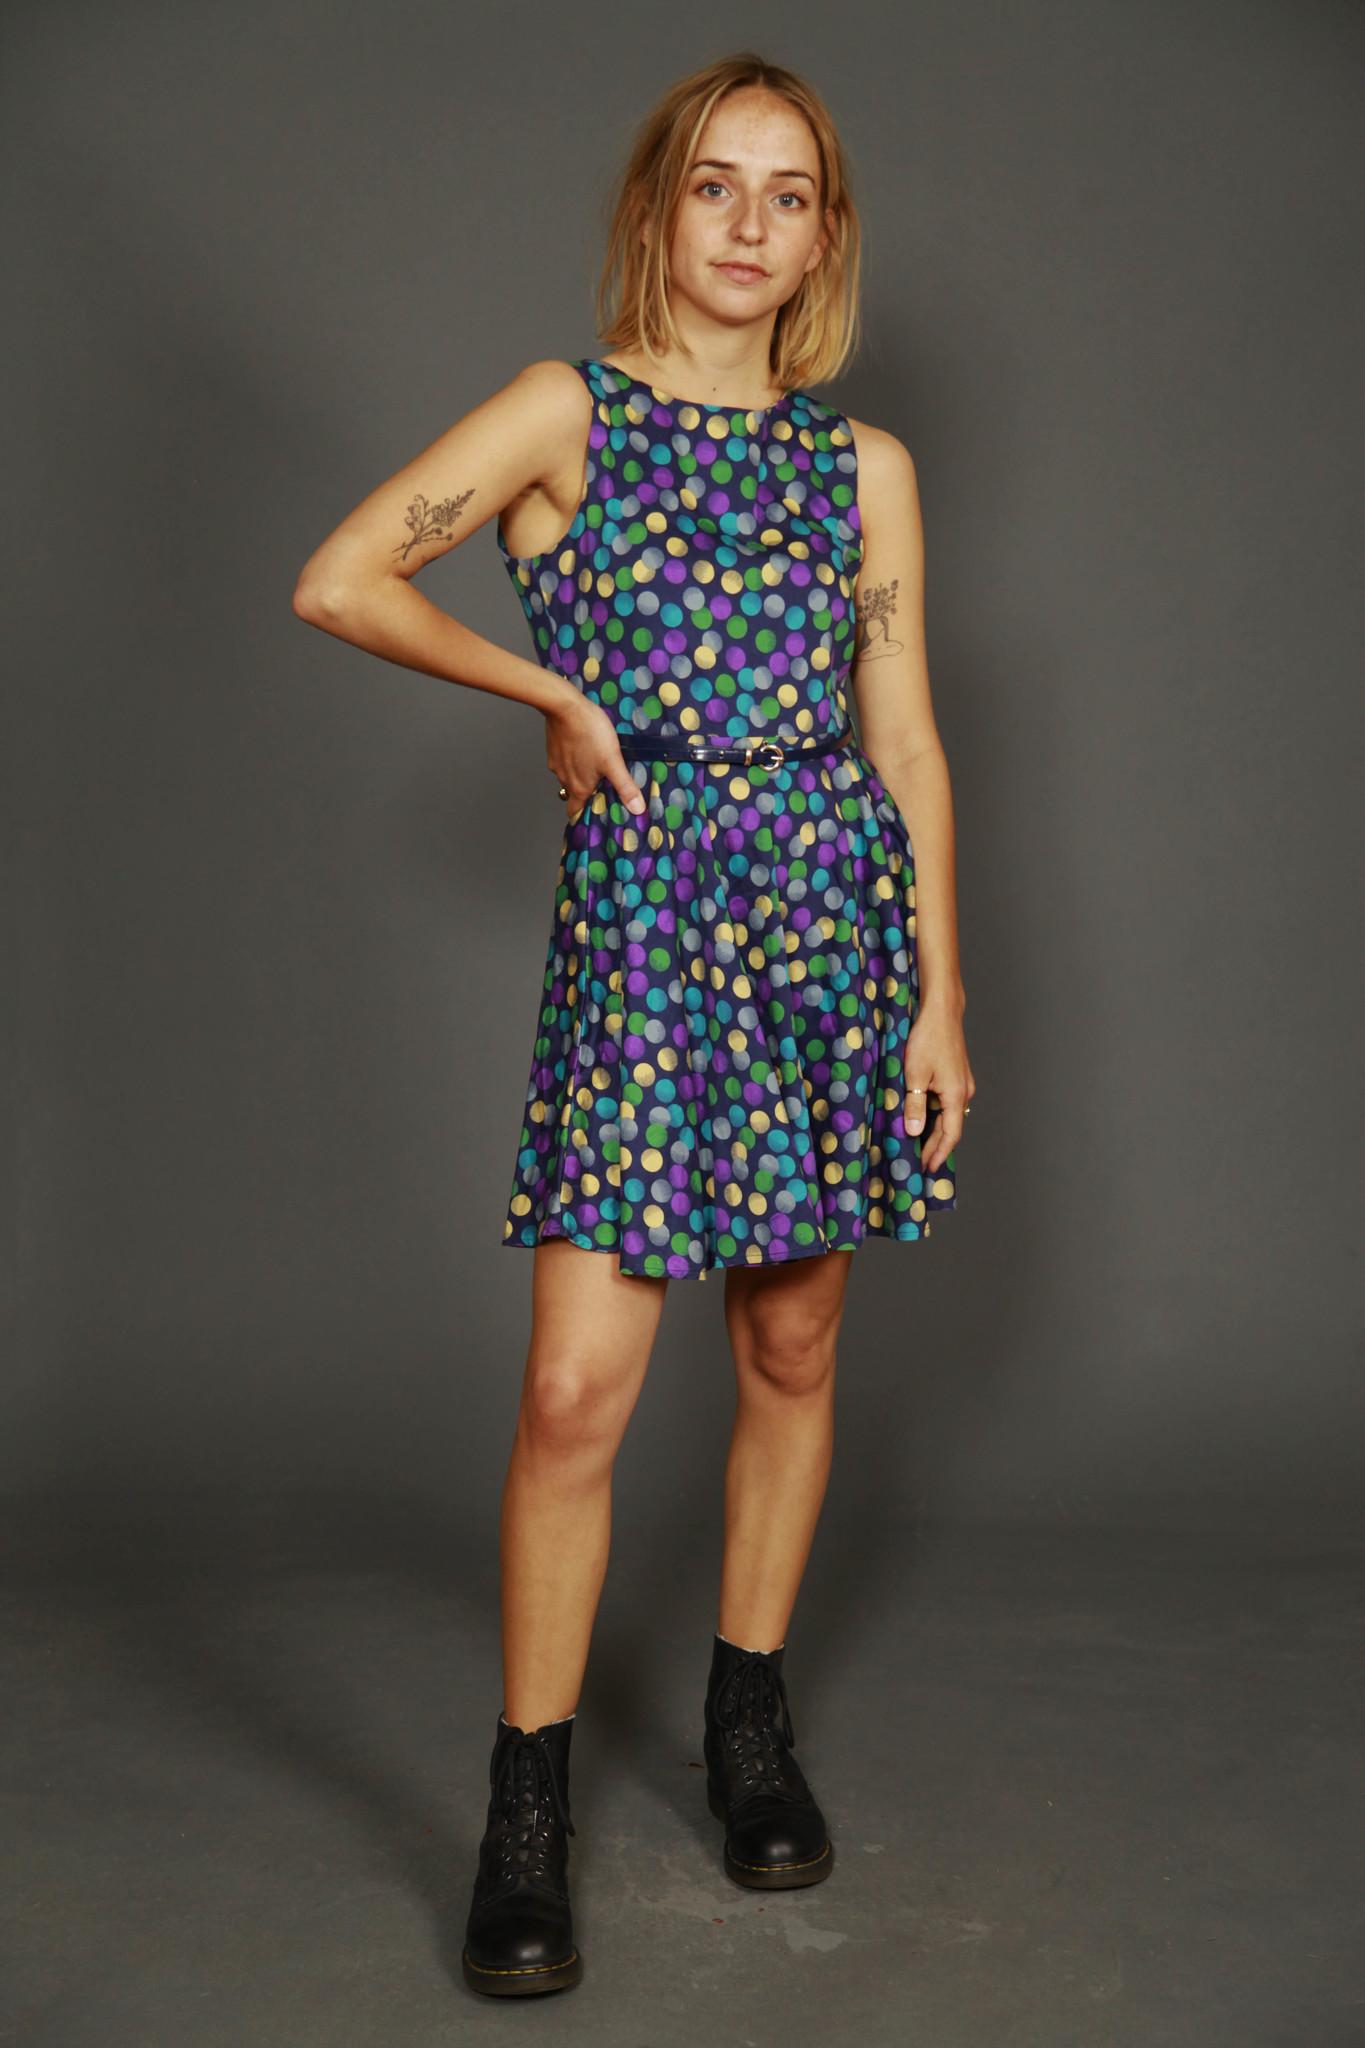 Sleeveless polka dot dress